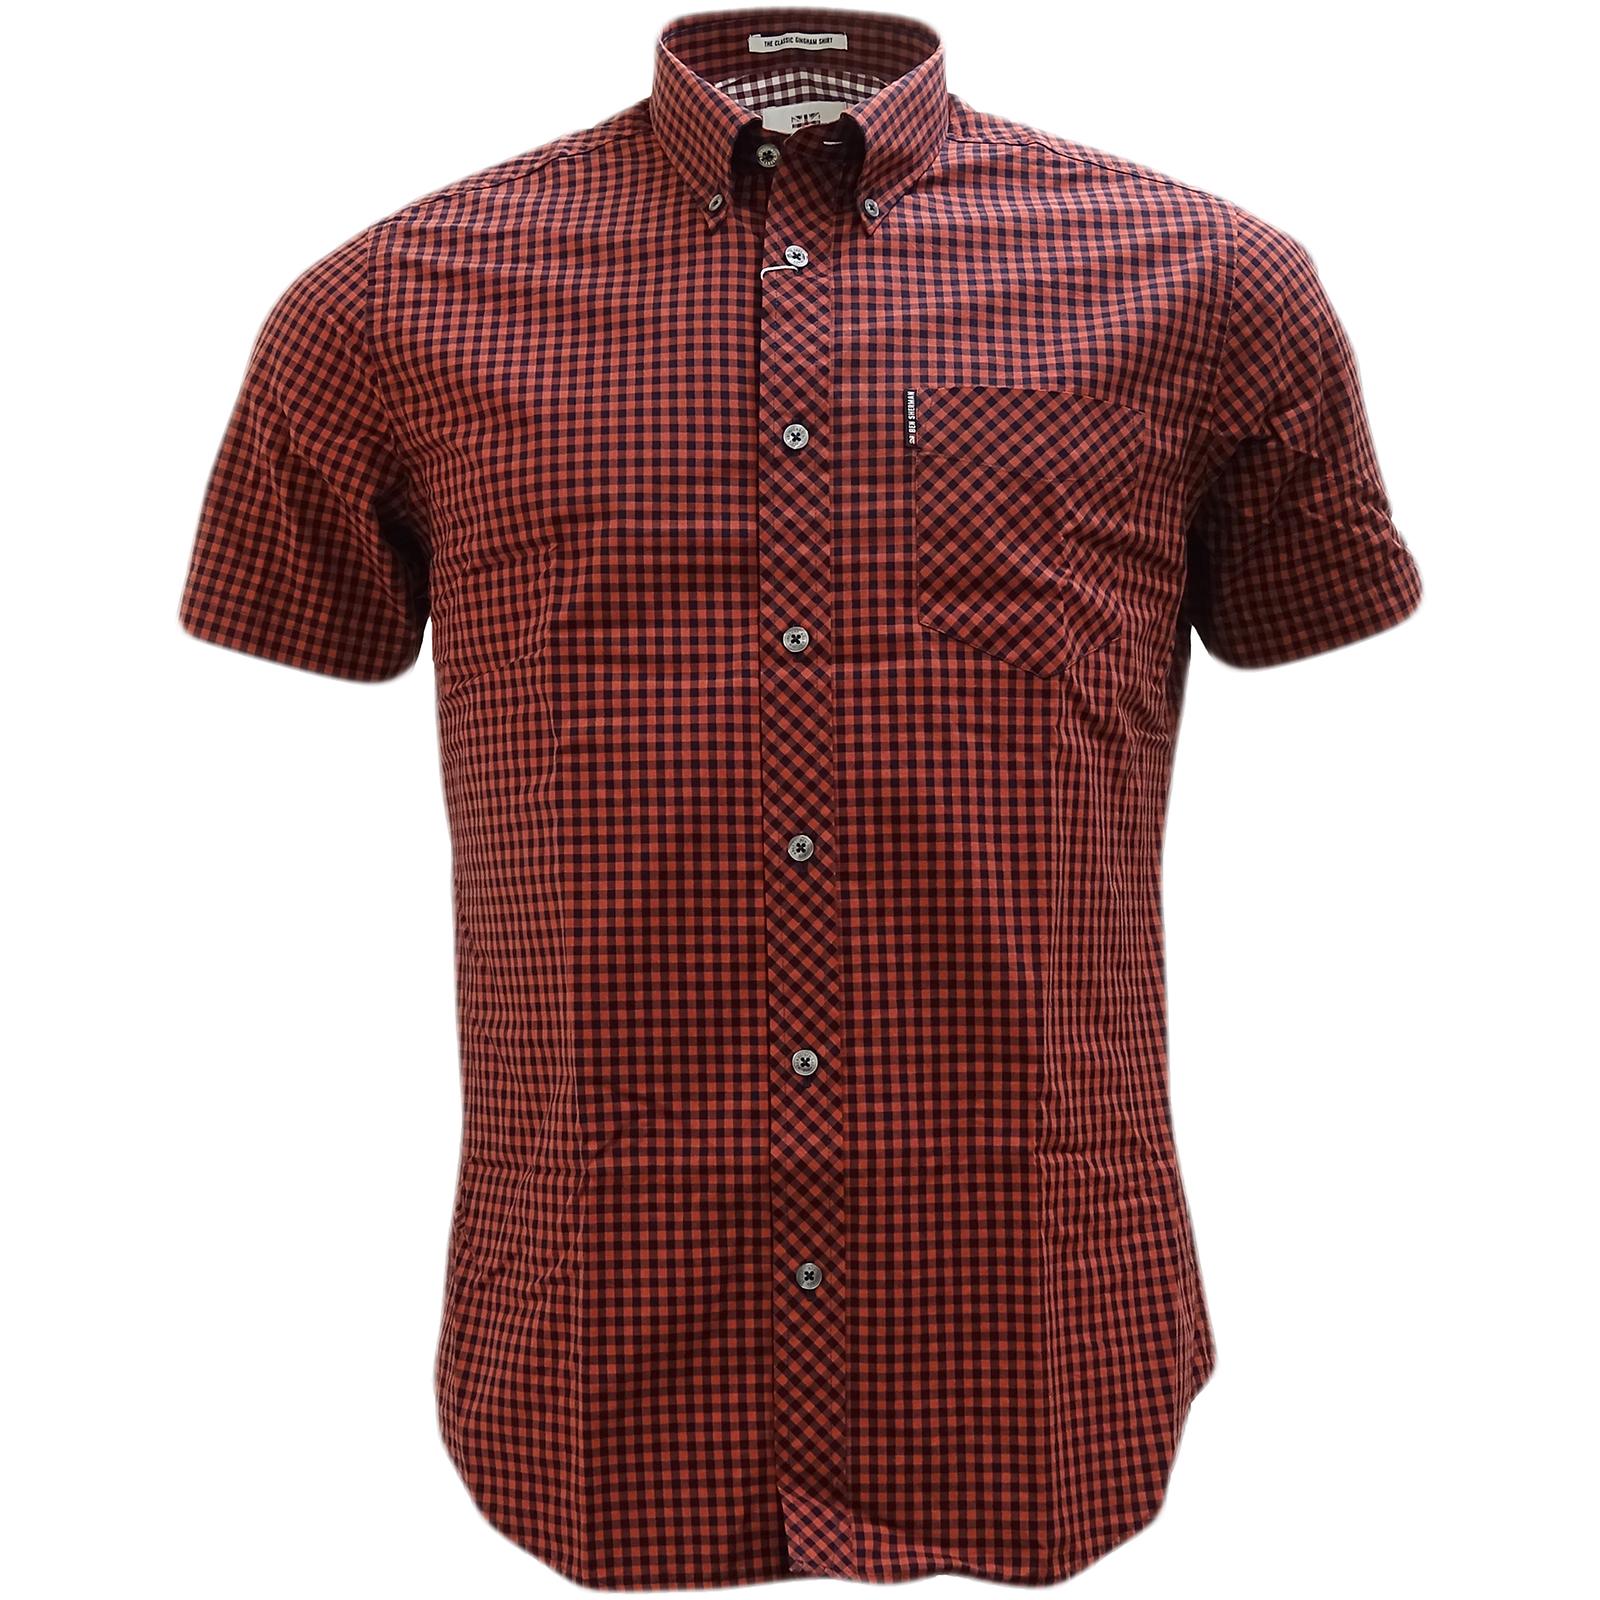 4c9b03bb15 Mens-Shirts-by-Ben-Sherman-47949 thumbnail 21